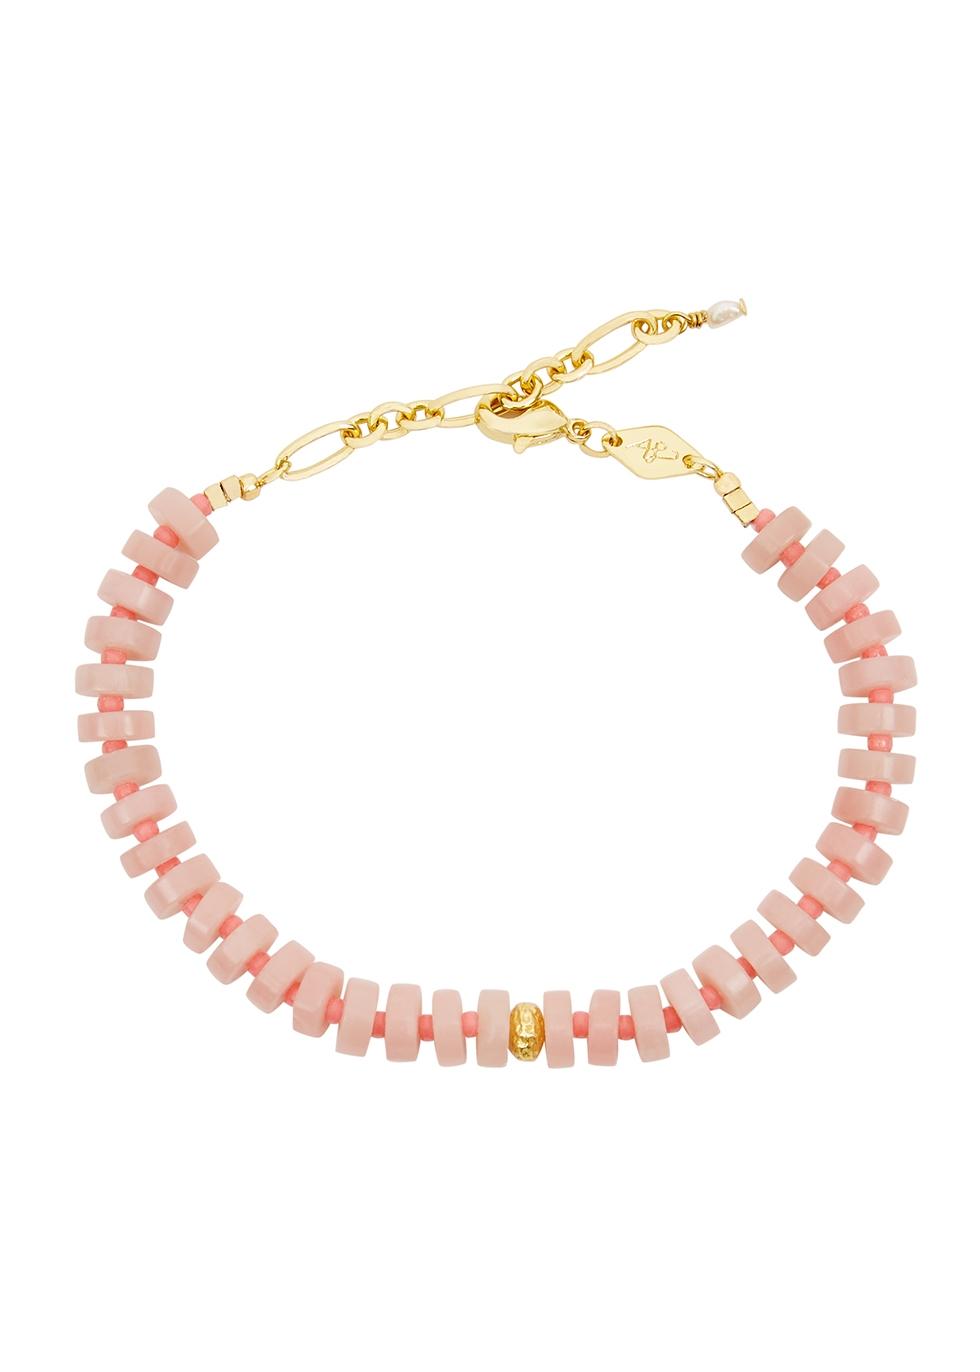 The Big Pink beaded bracelet